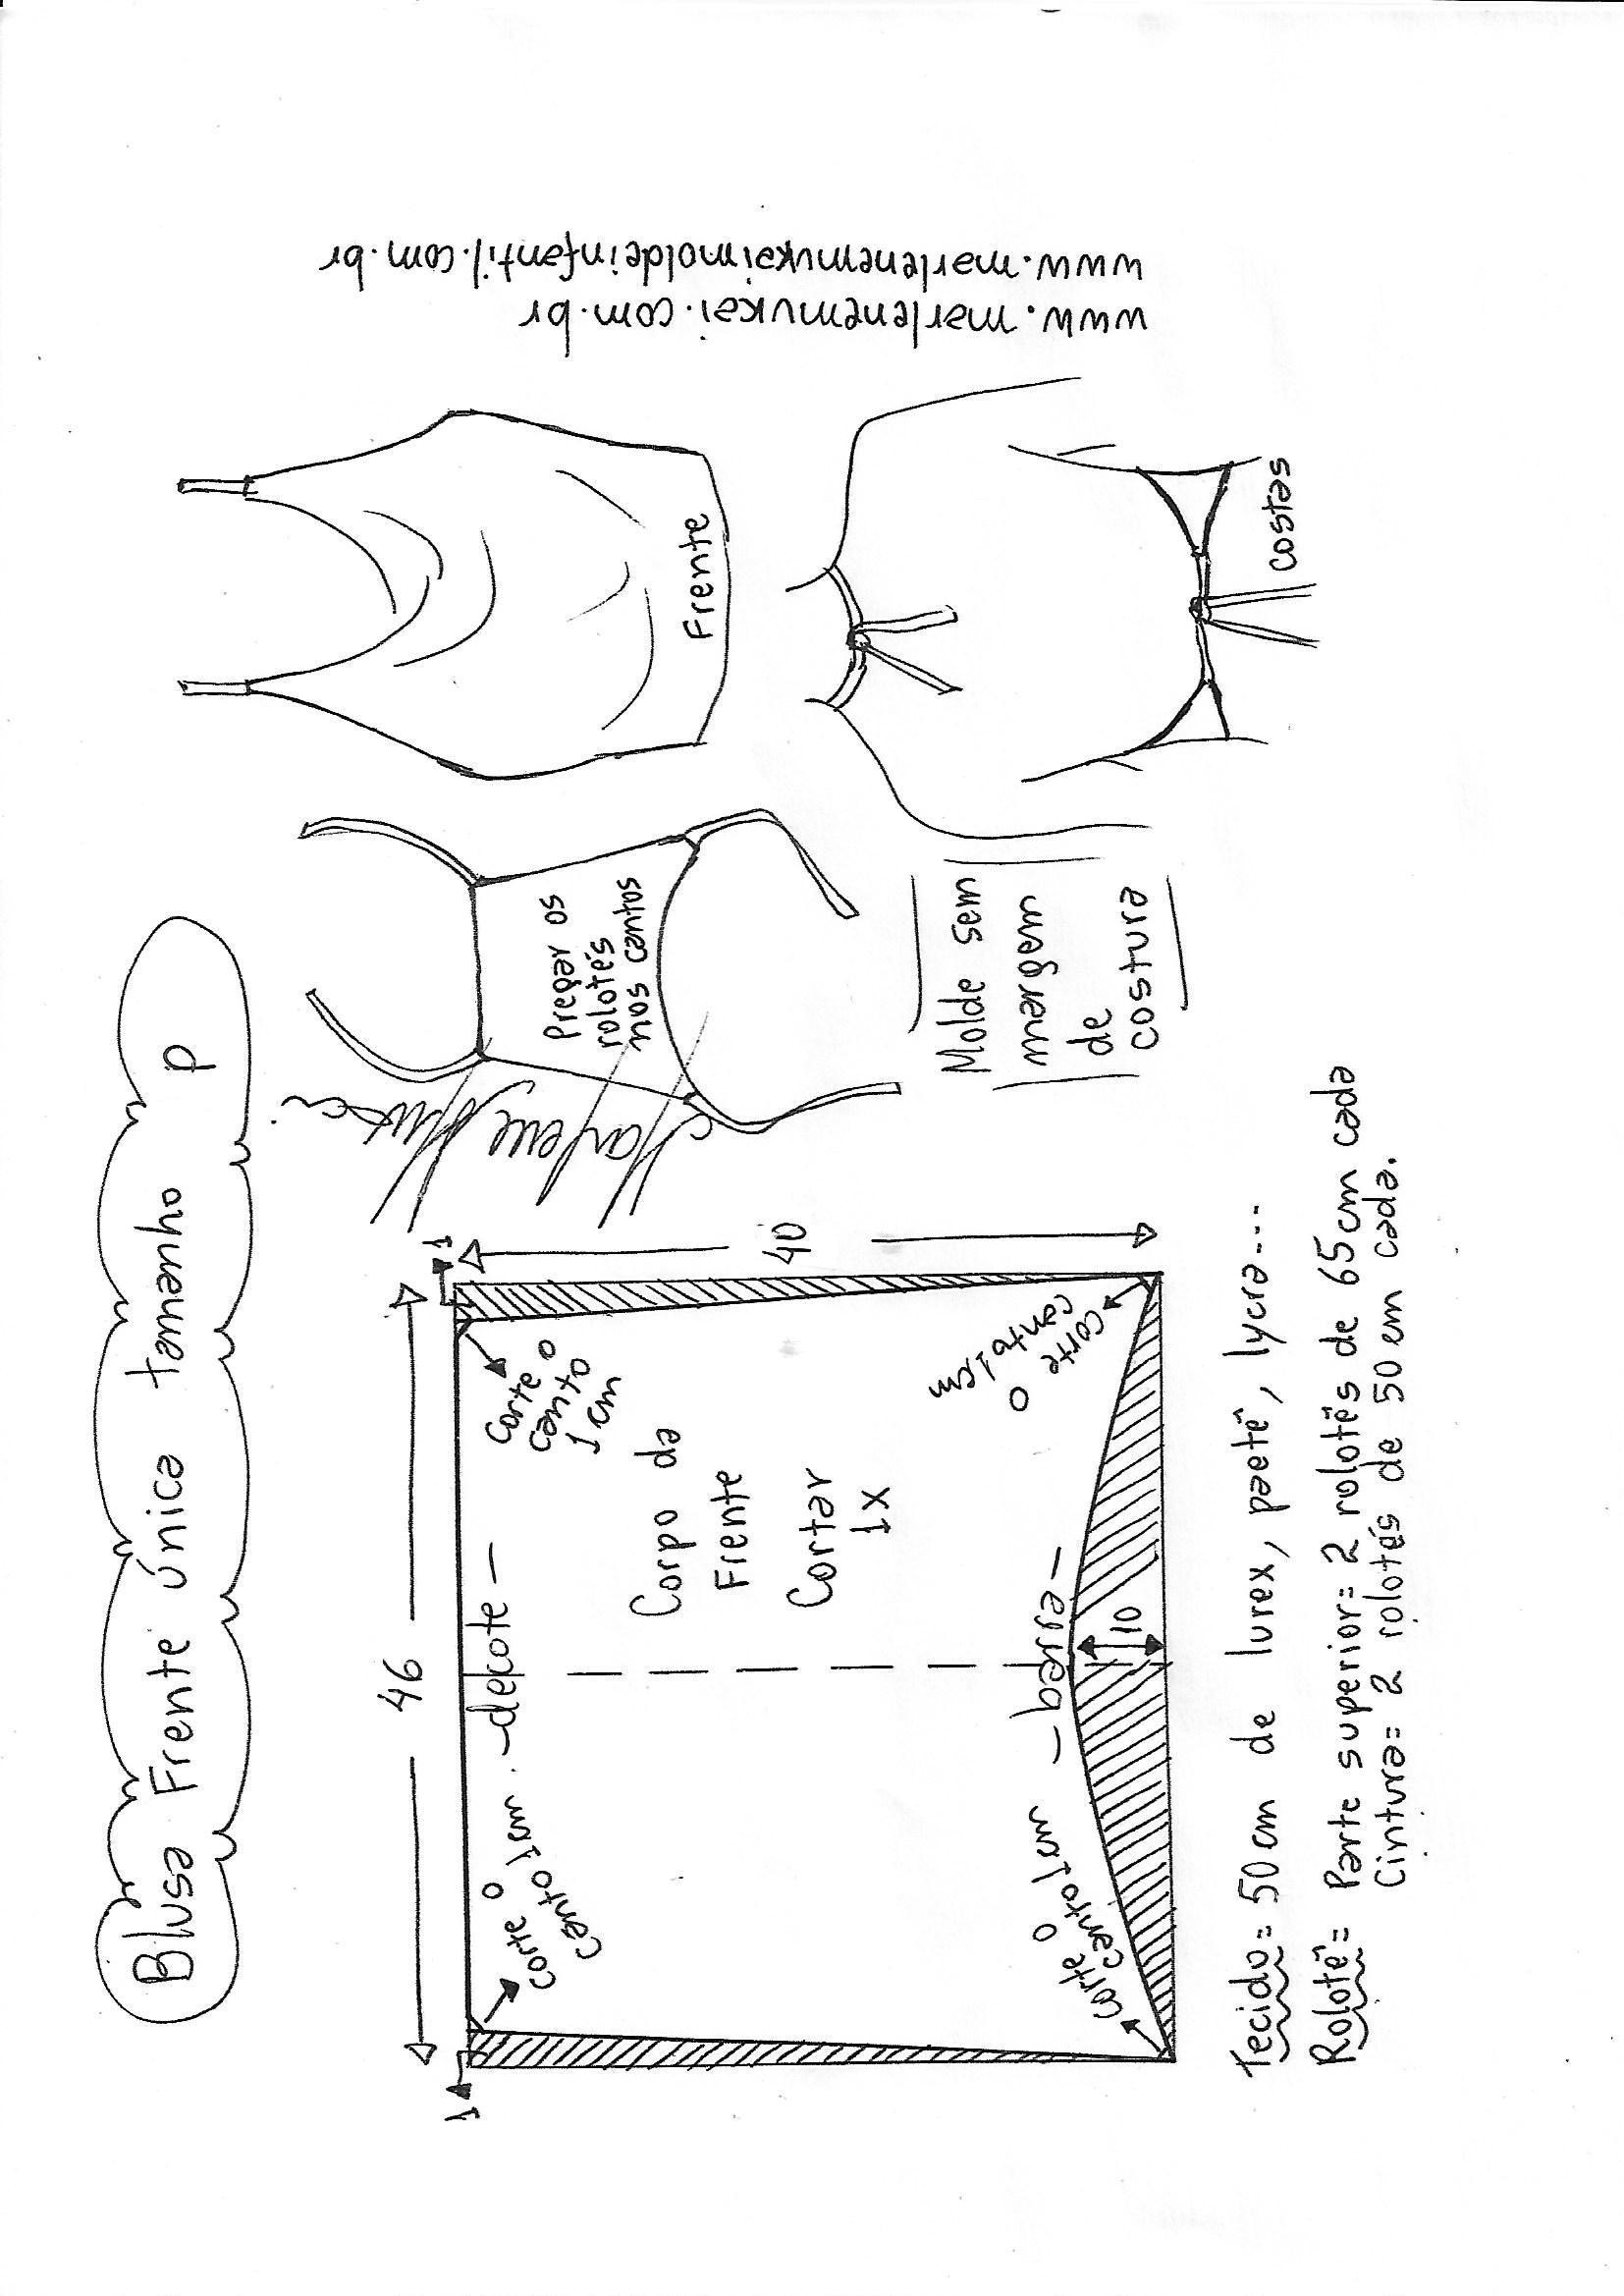 Pin de Elma lucía en Patrones de costura | Pinterest | Molde ...